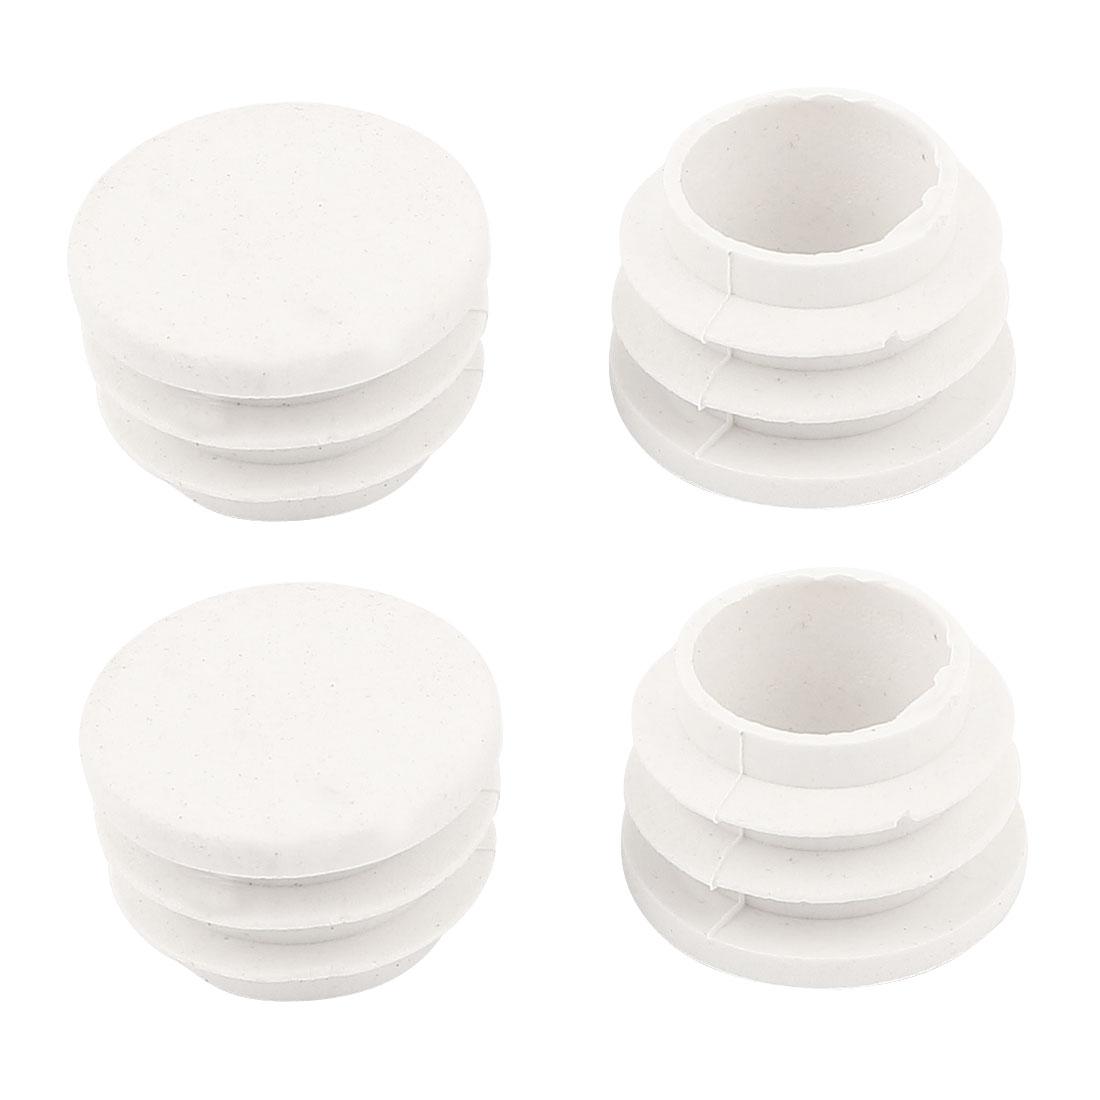 4 Pcs White Plastic 22mm Dia Round Tubing Tube Insert Caps Covers